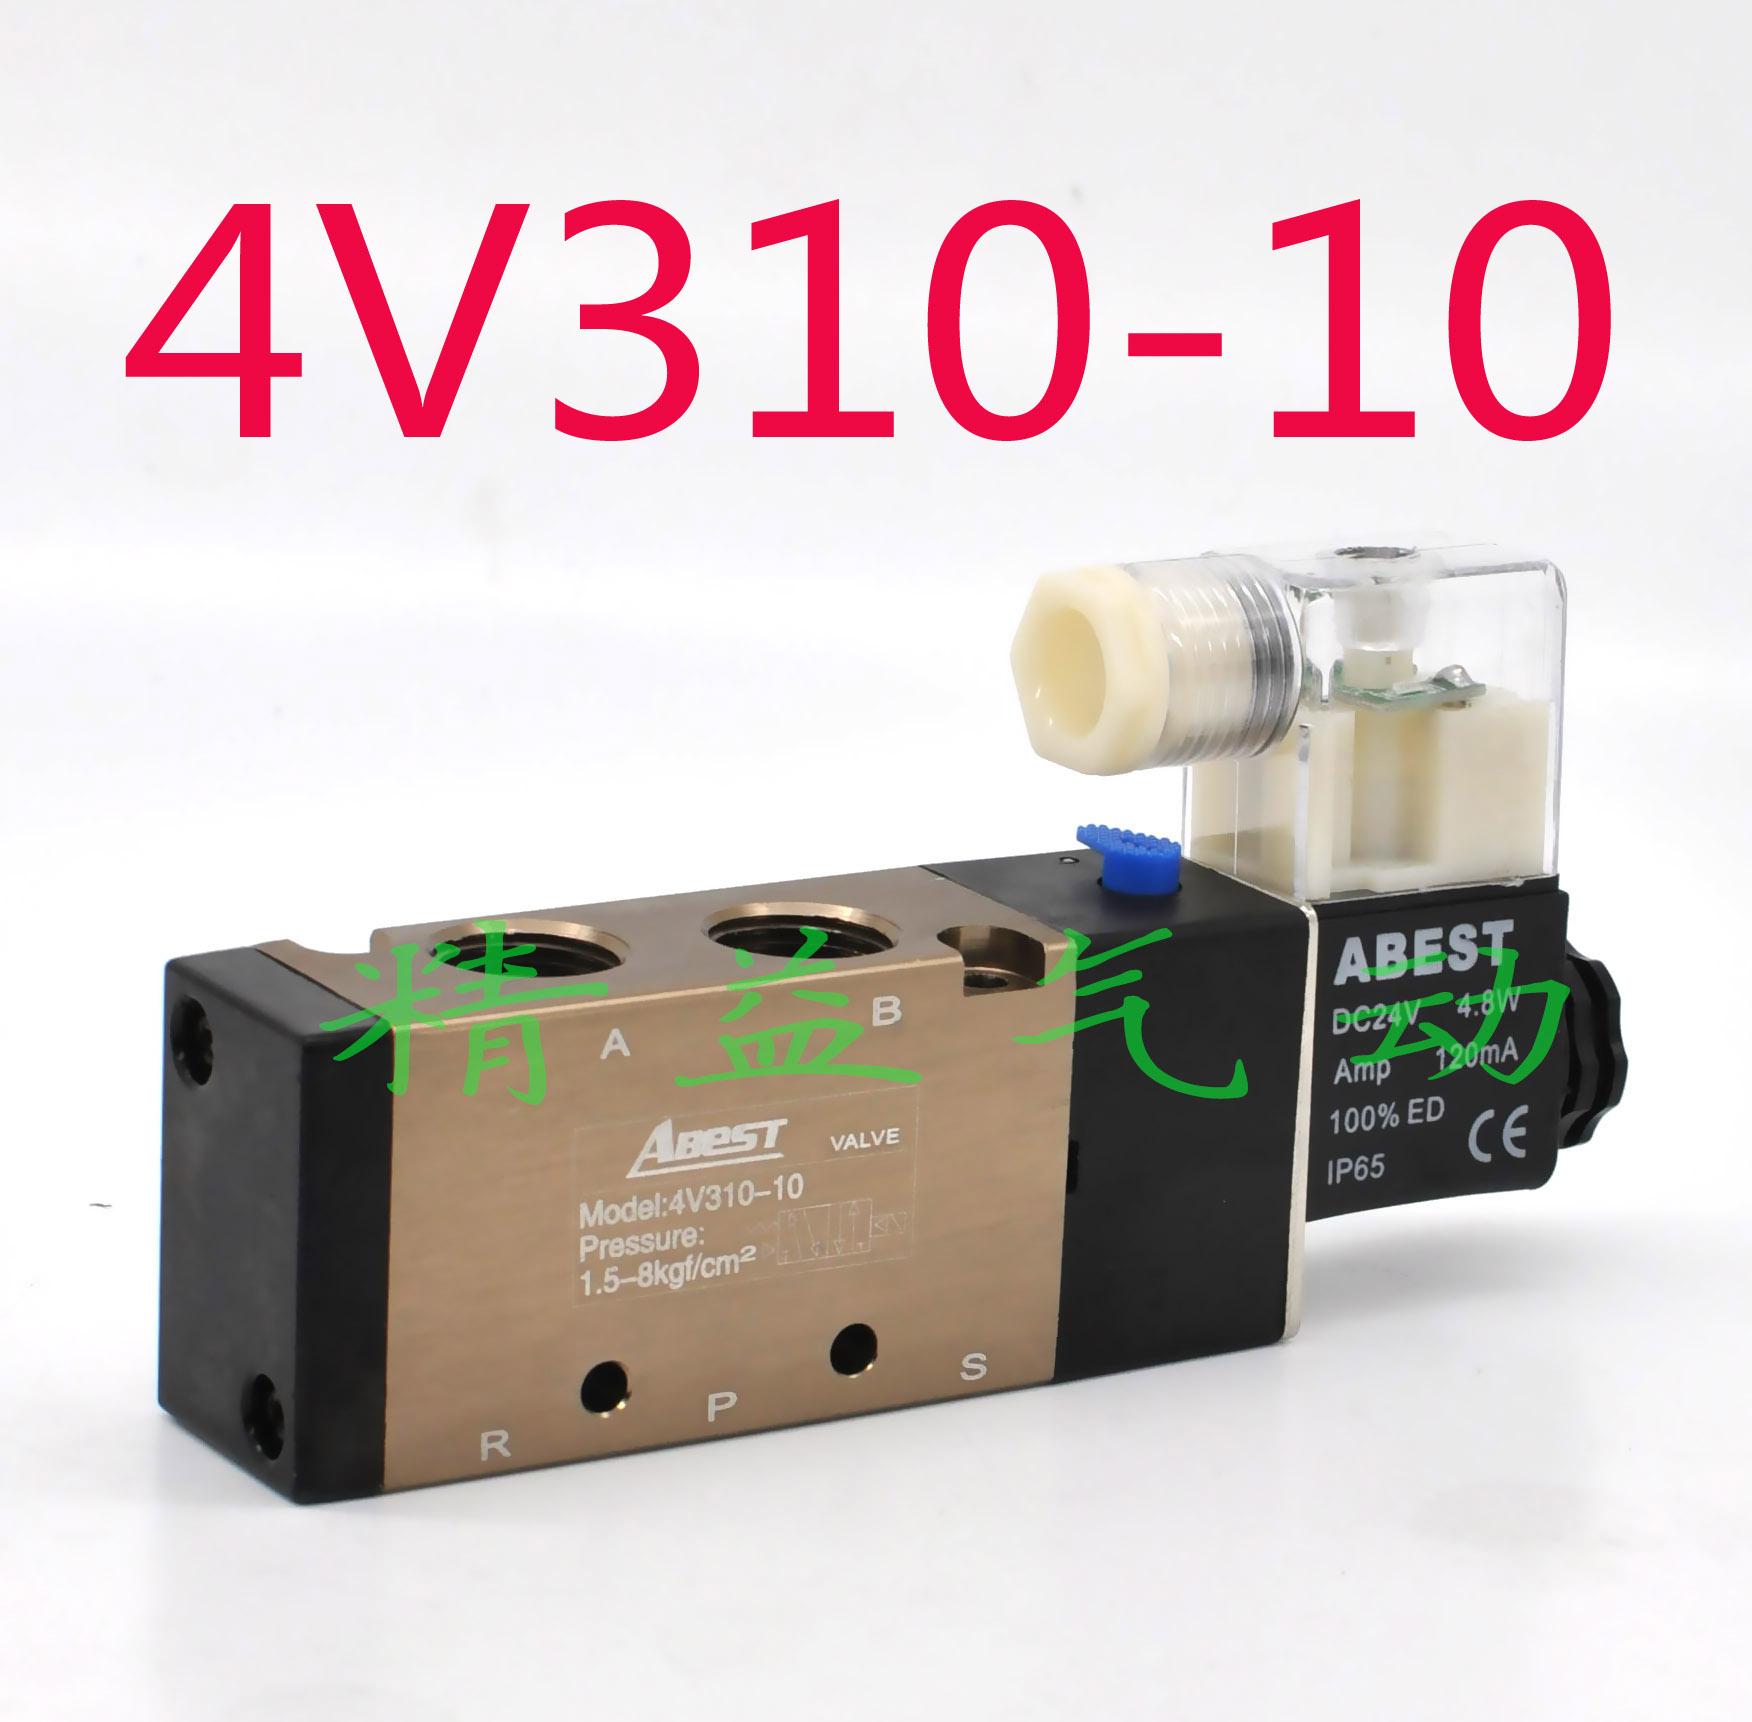 4V3104V3204V330-10亚德客形電磁弁空気制御弁整流2位と3位5通